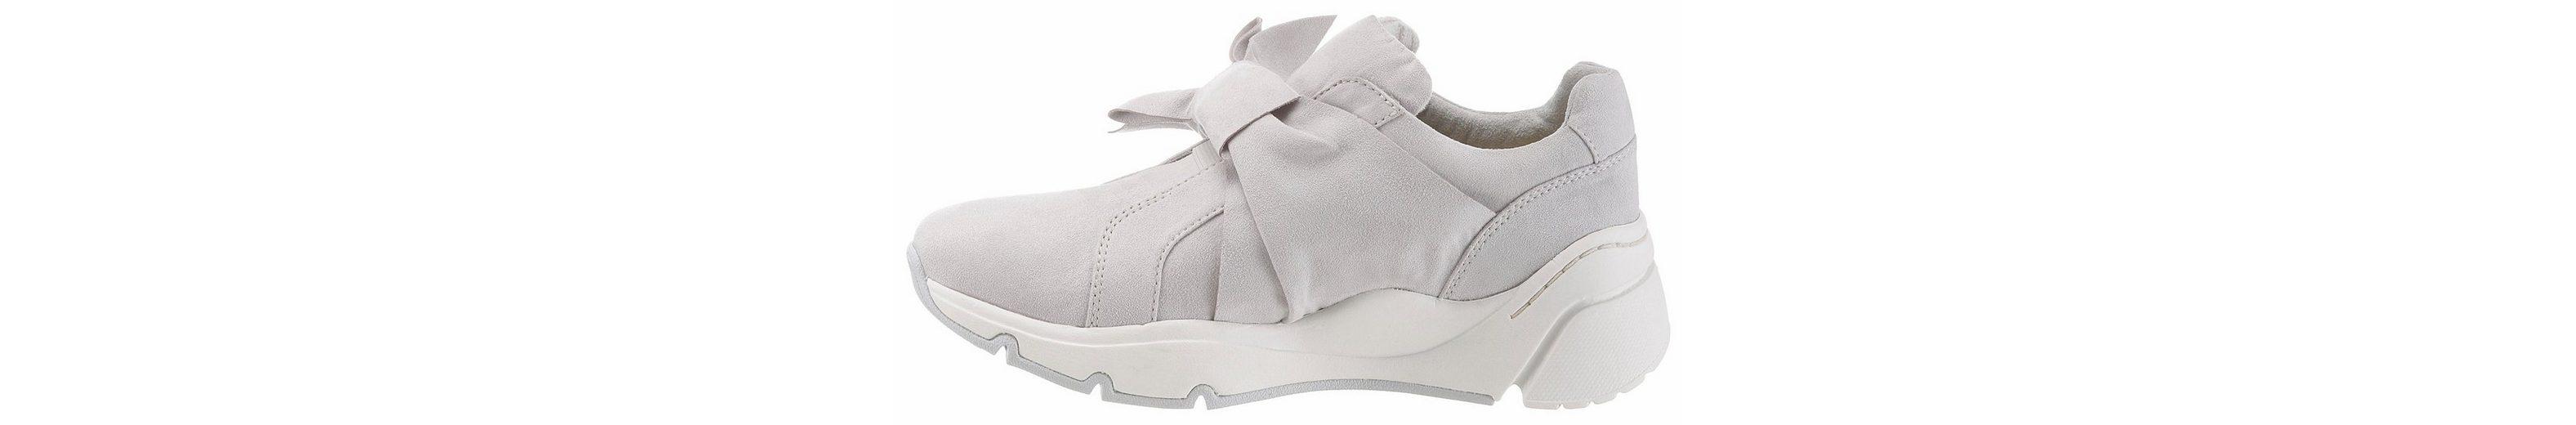 Tamaris Fashletics Slip-On Sneaker, mit auffälliger Schleife